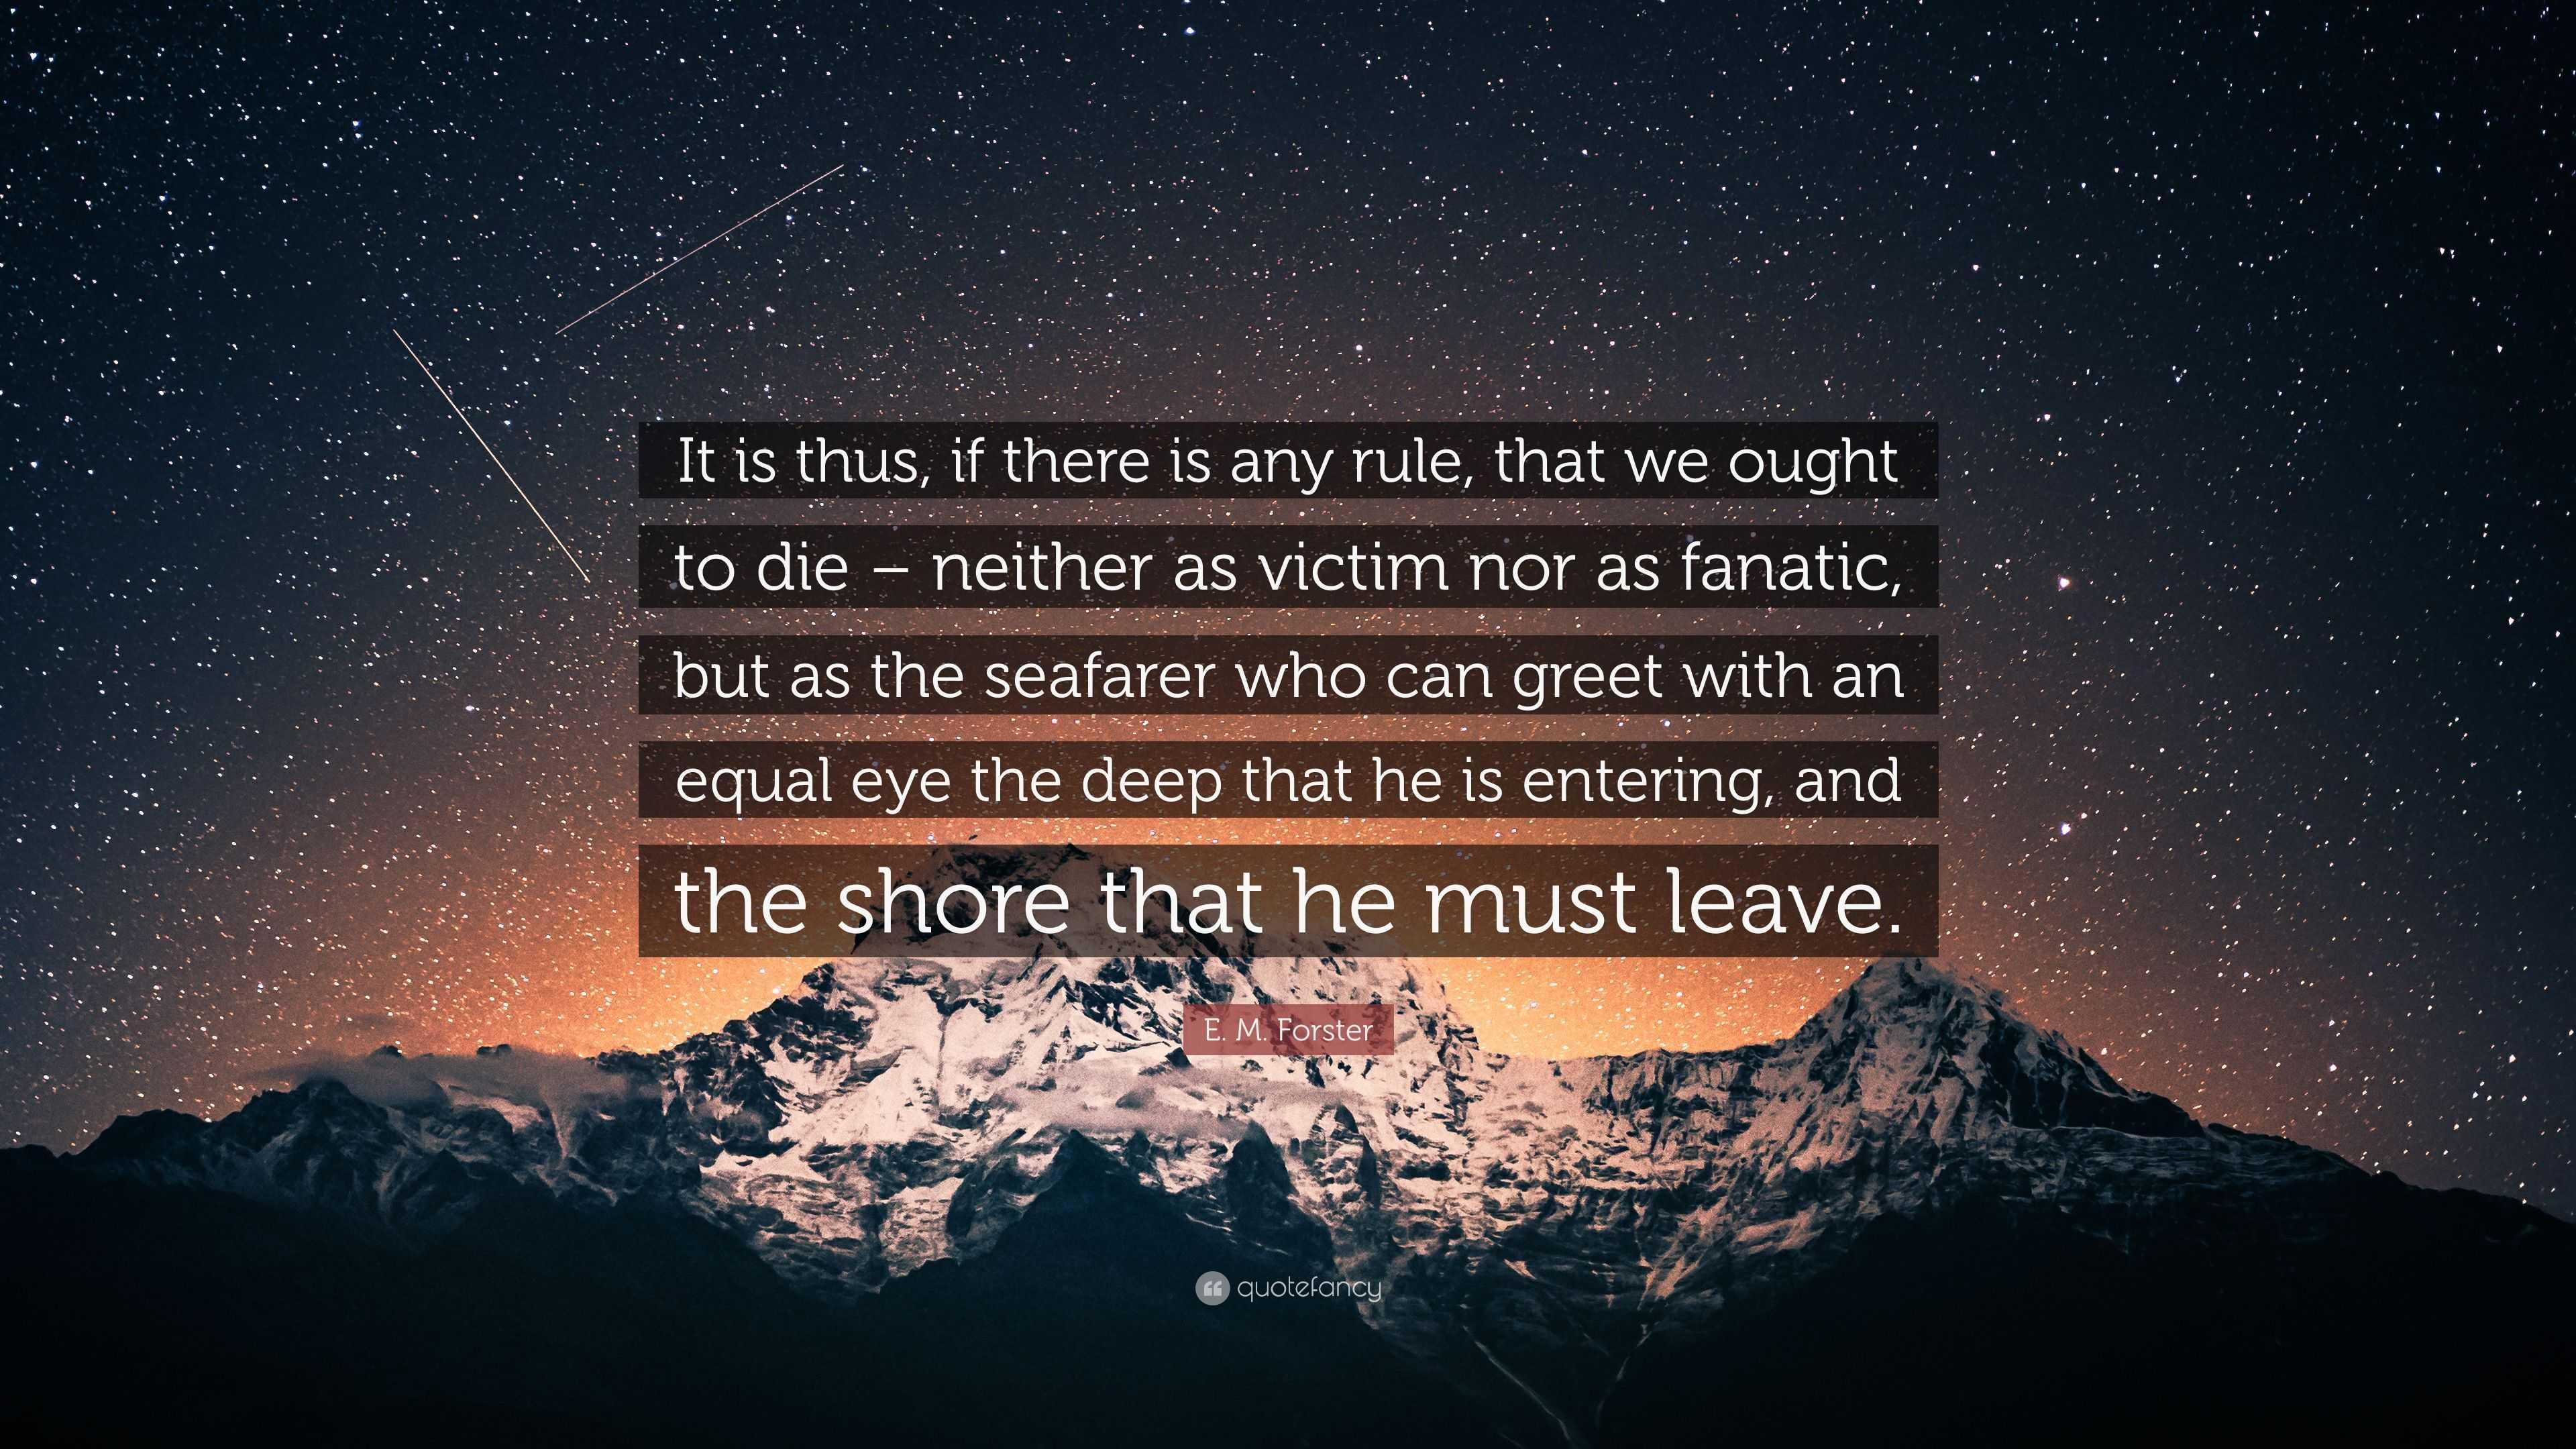 Image result for EM Forster the seafarer quote